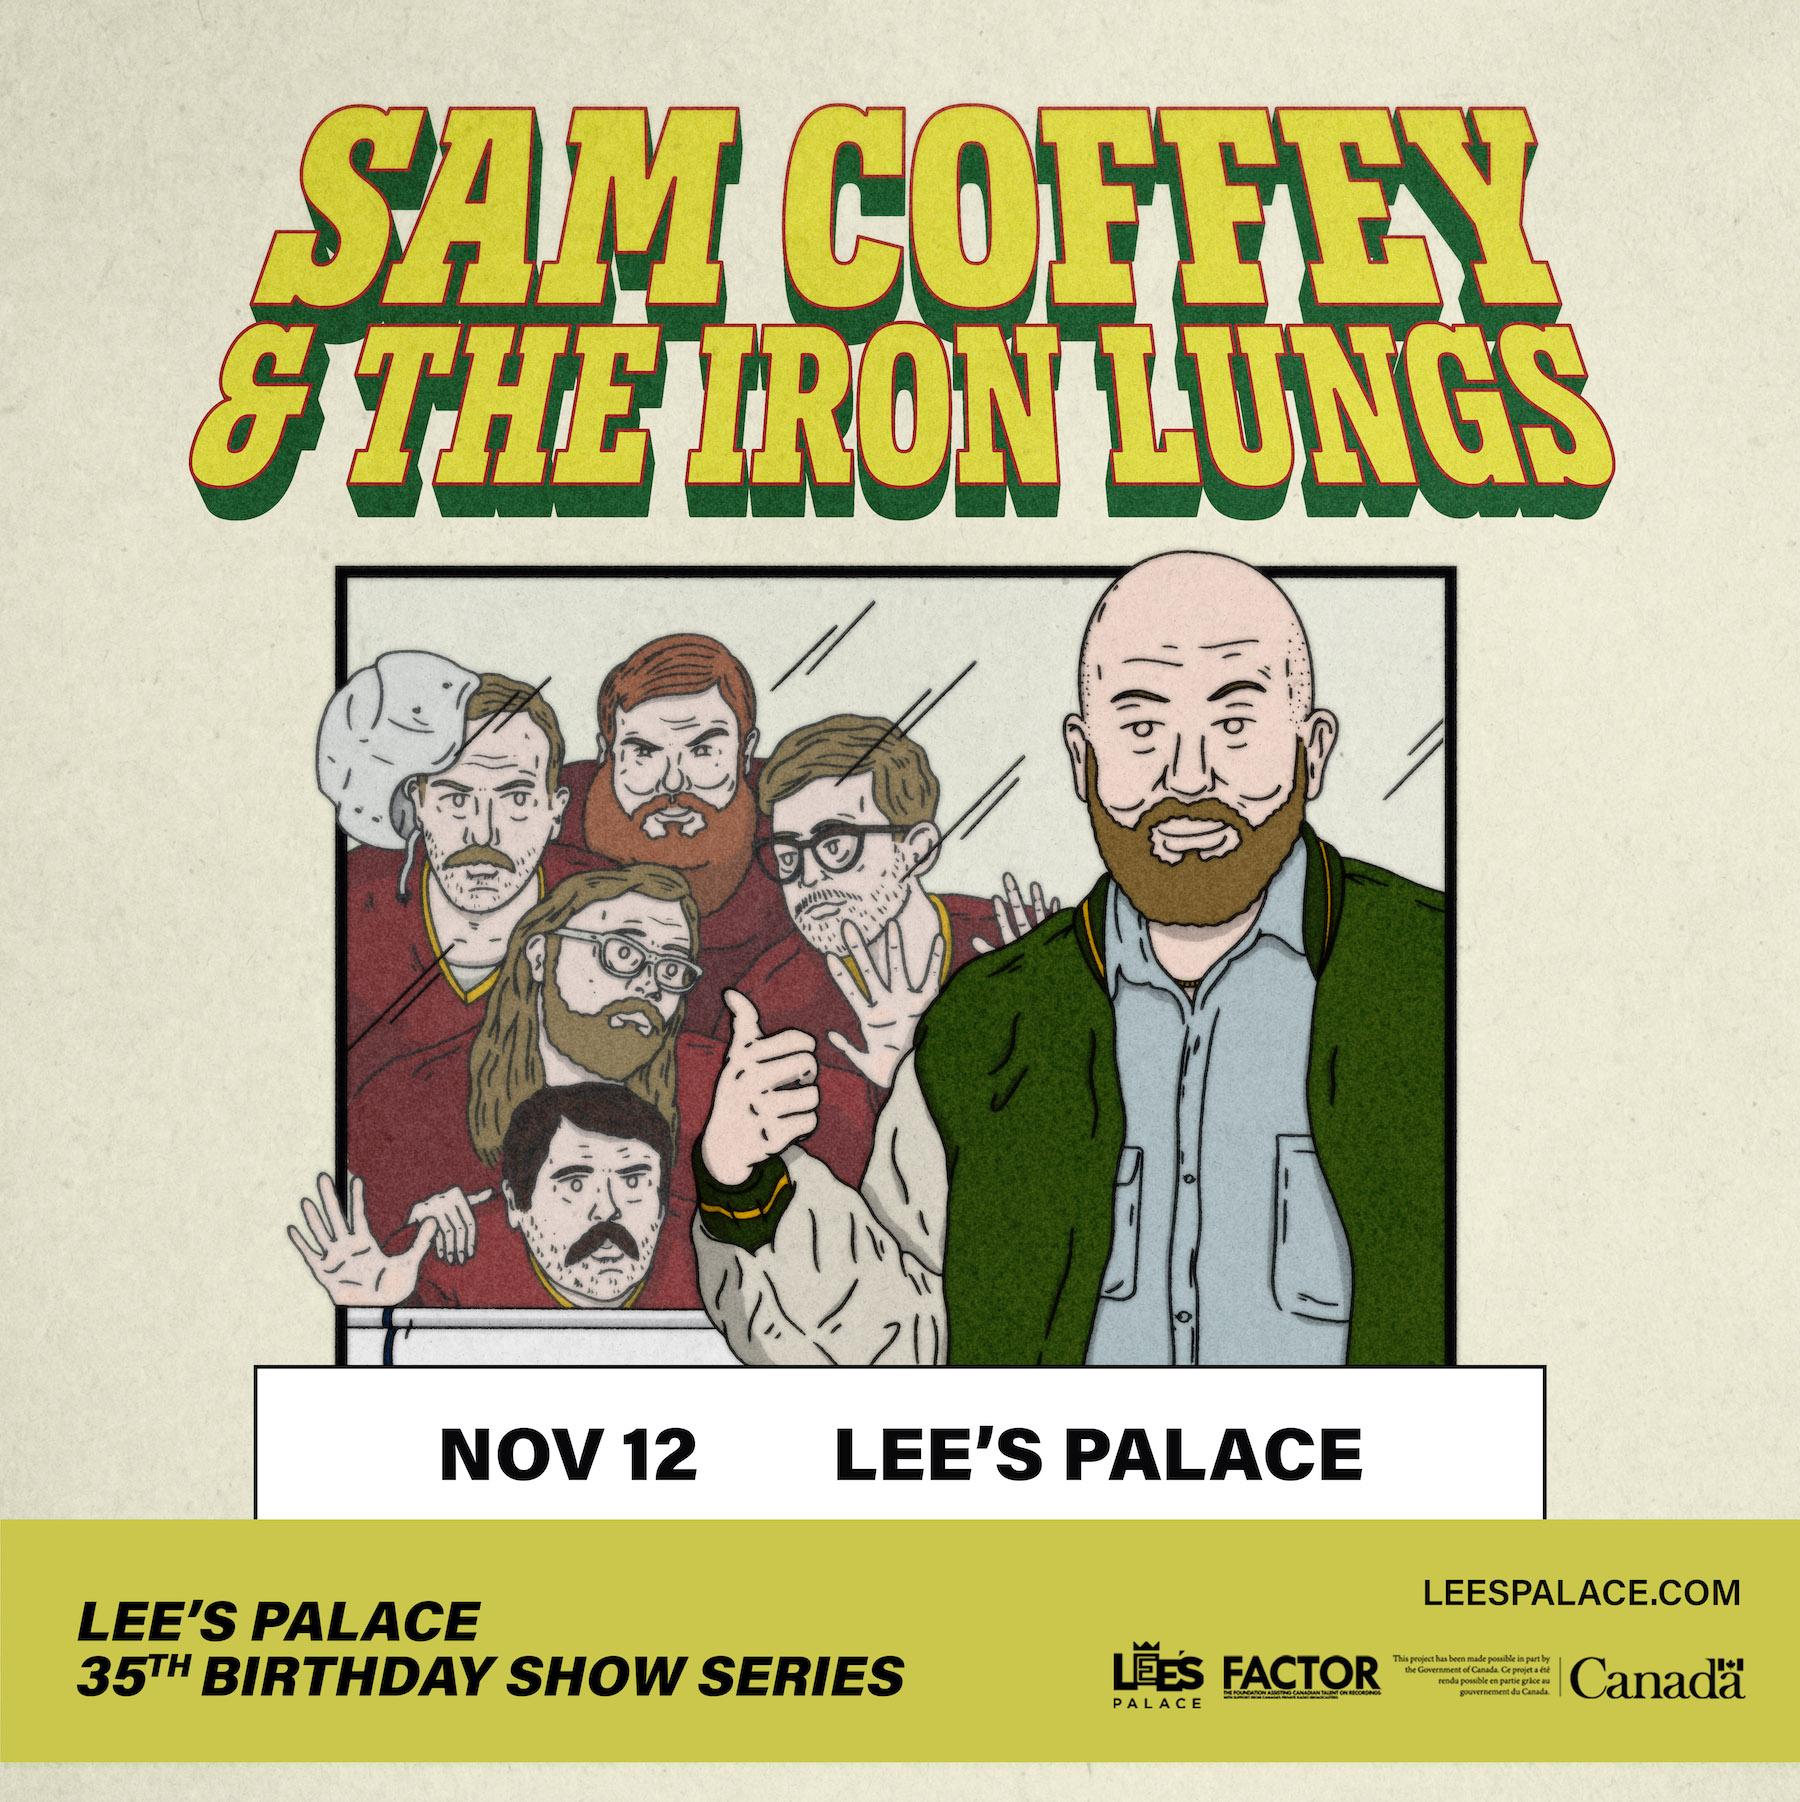 Sam Coffey & The Iron Lungs